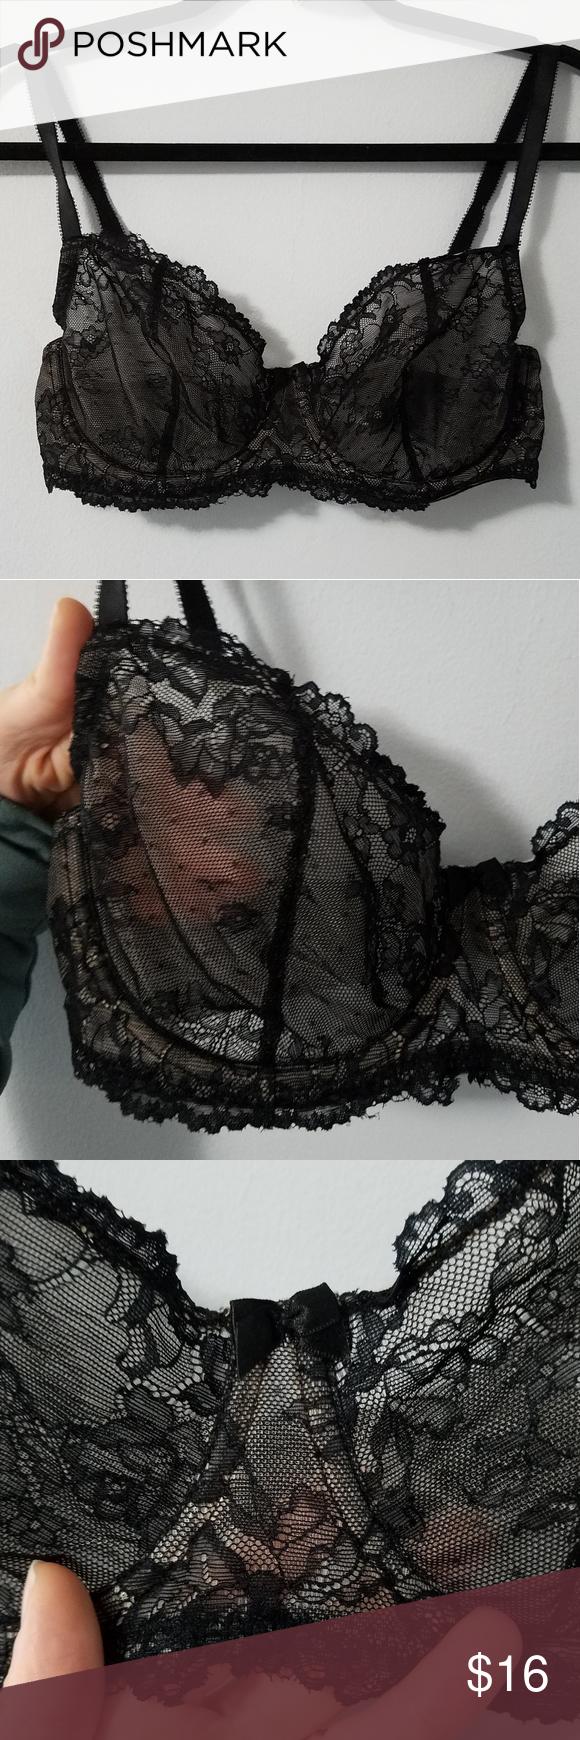 b9d4adffde0ad Sexy Apt9 black pink mesh lace unlined bra